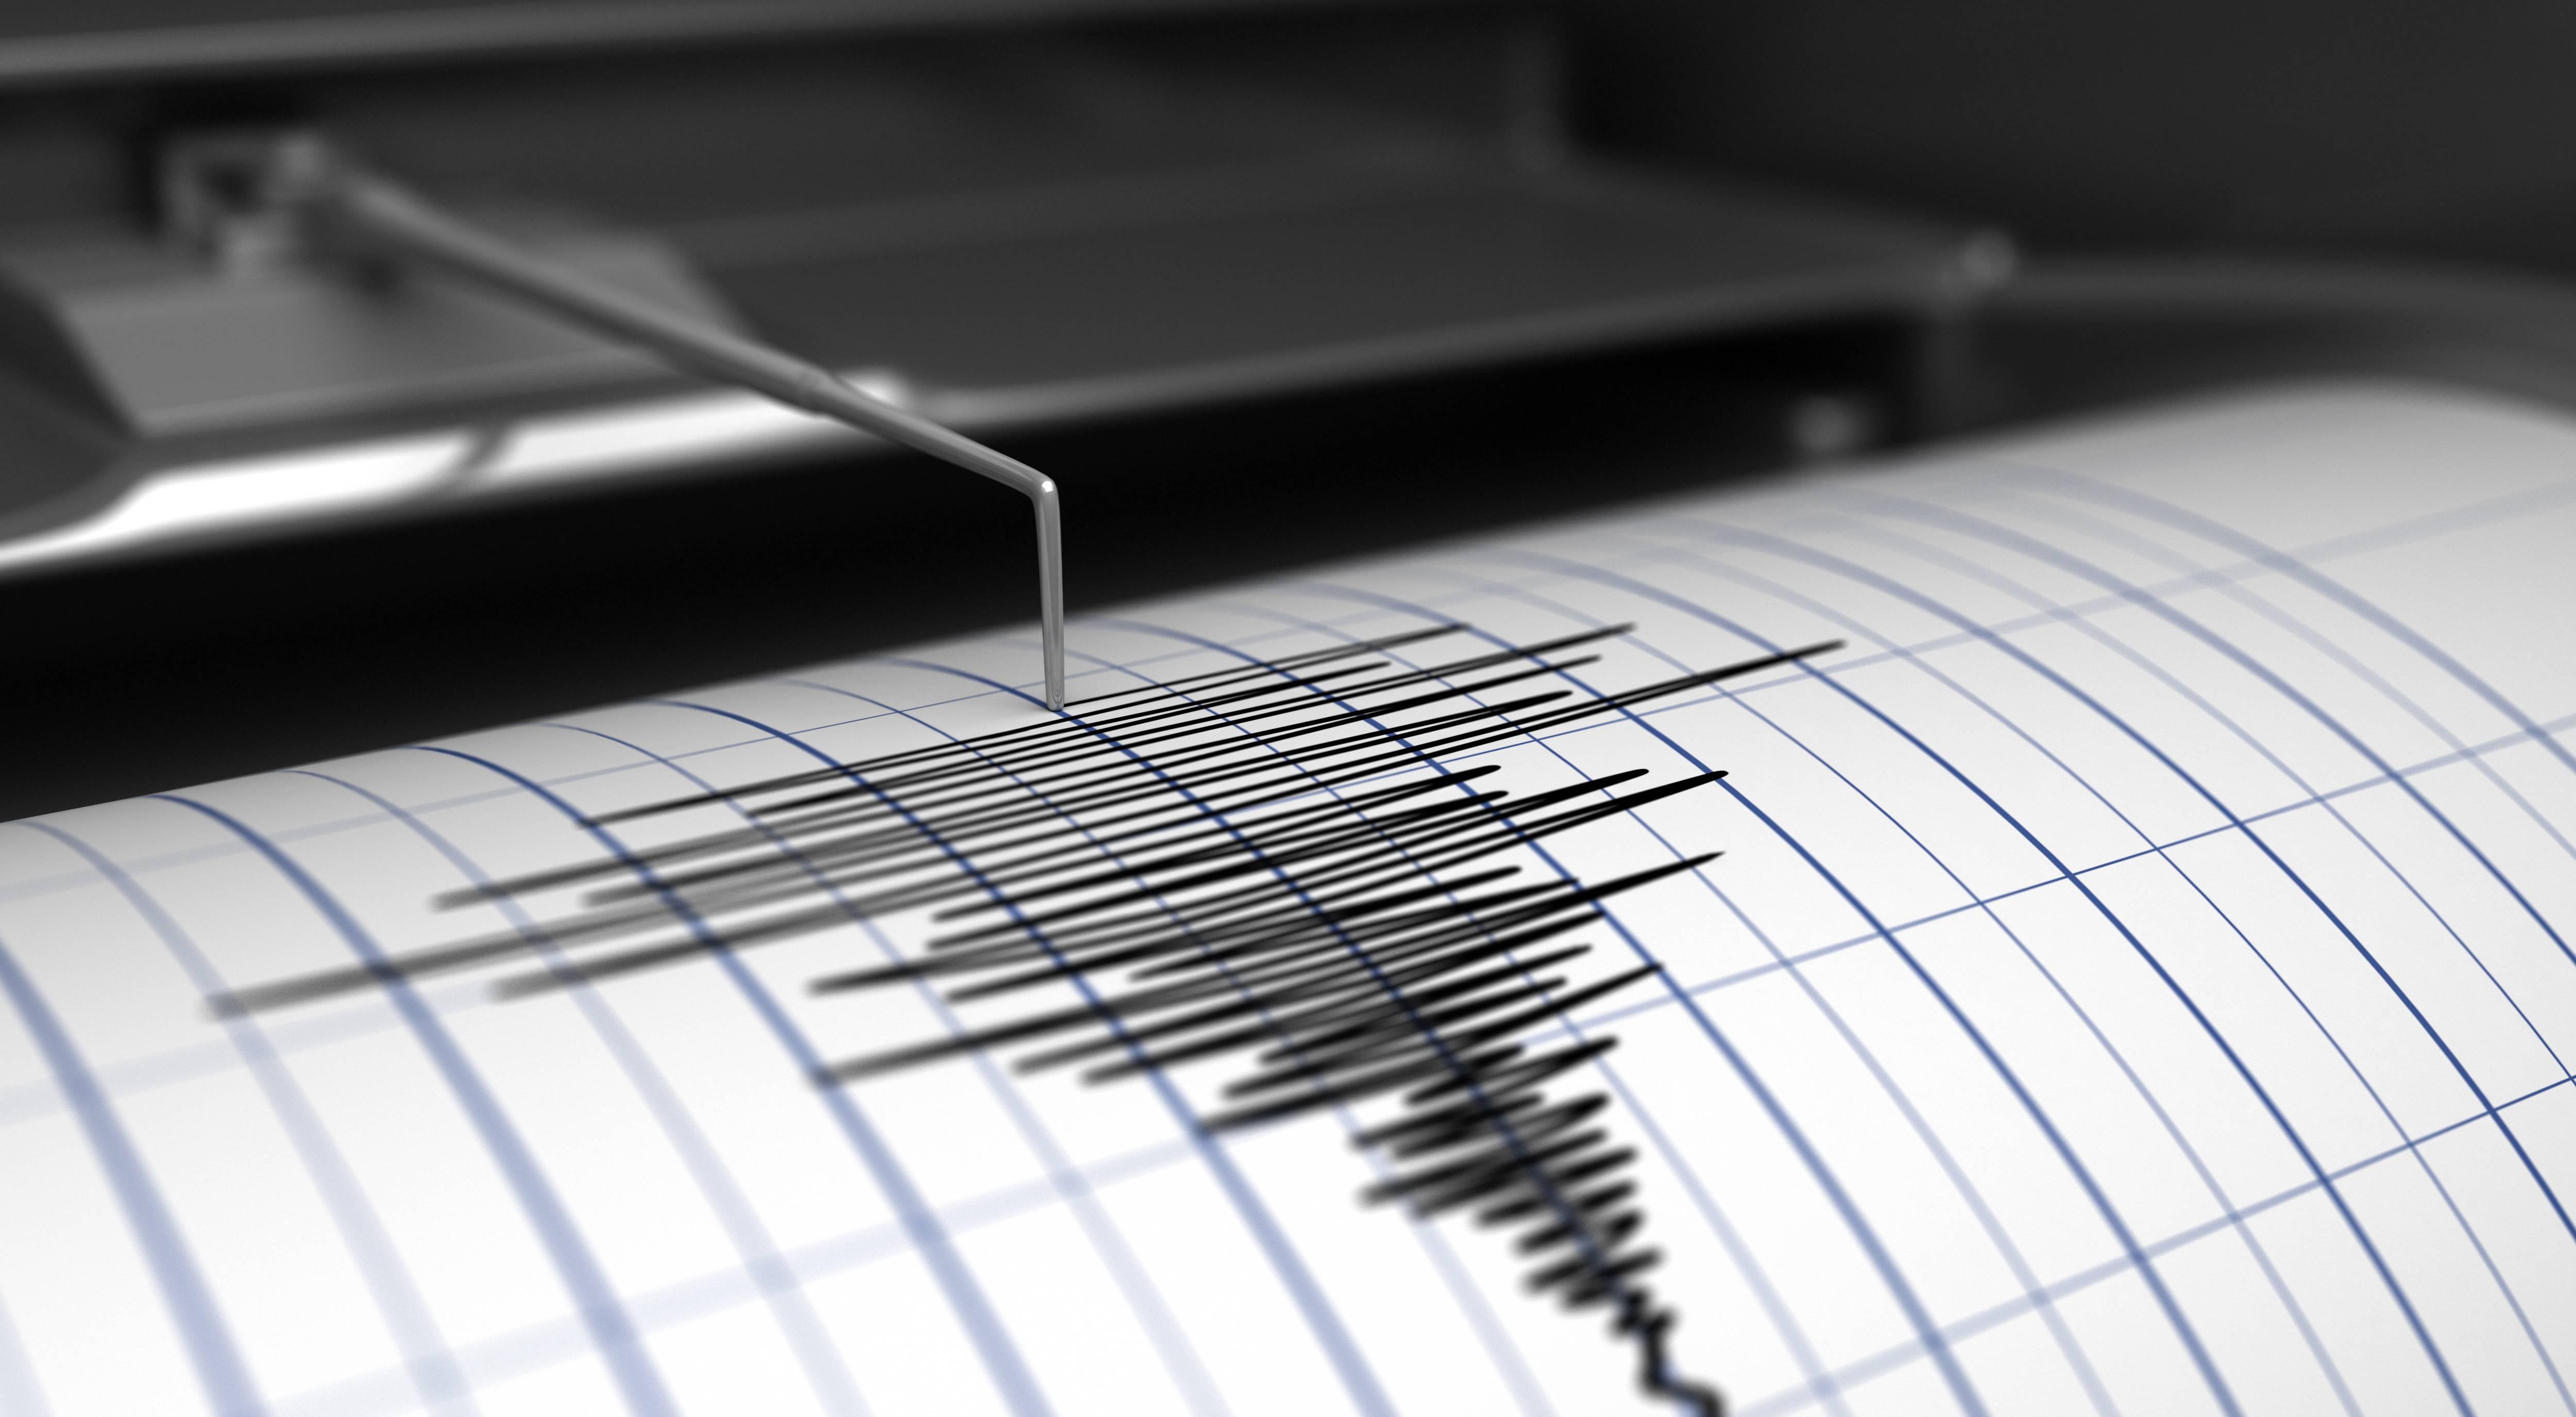 Sismografo scosse di terremoto